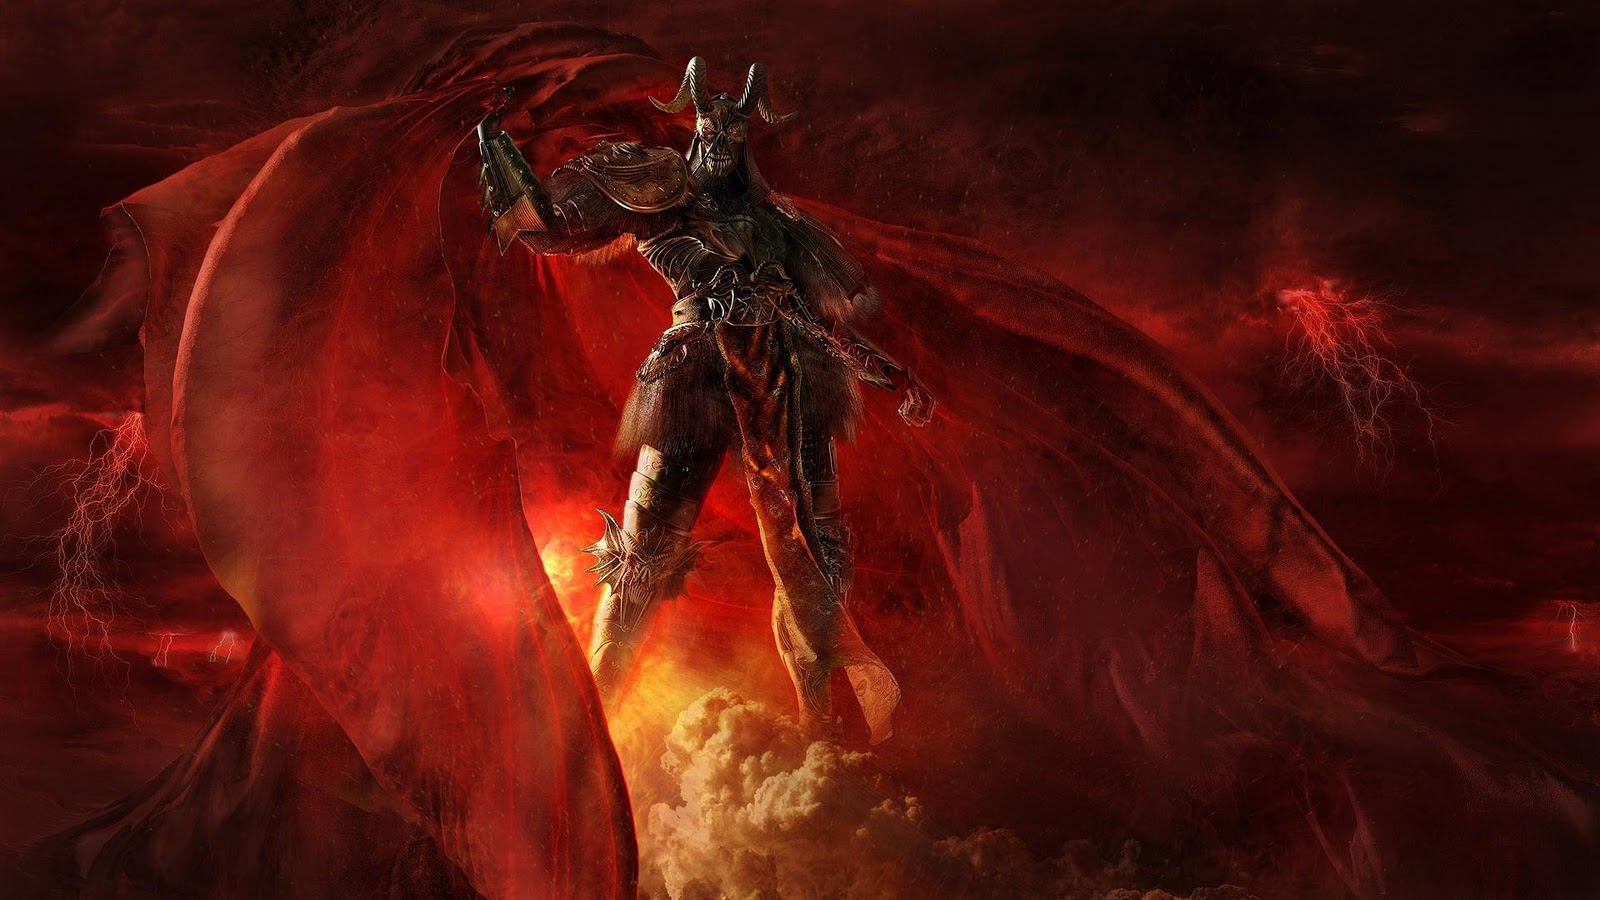 Bonewallpaper best desktop hd wallpapers devil desktop wallpapers - Free evil angel pictures ...